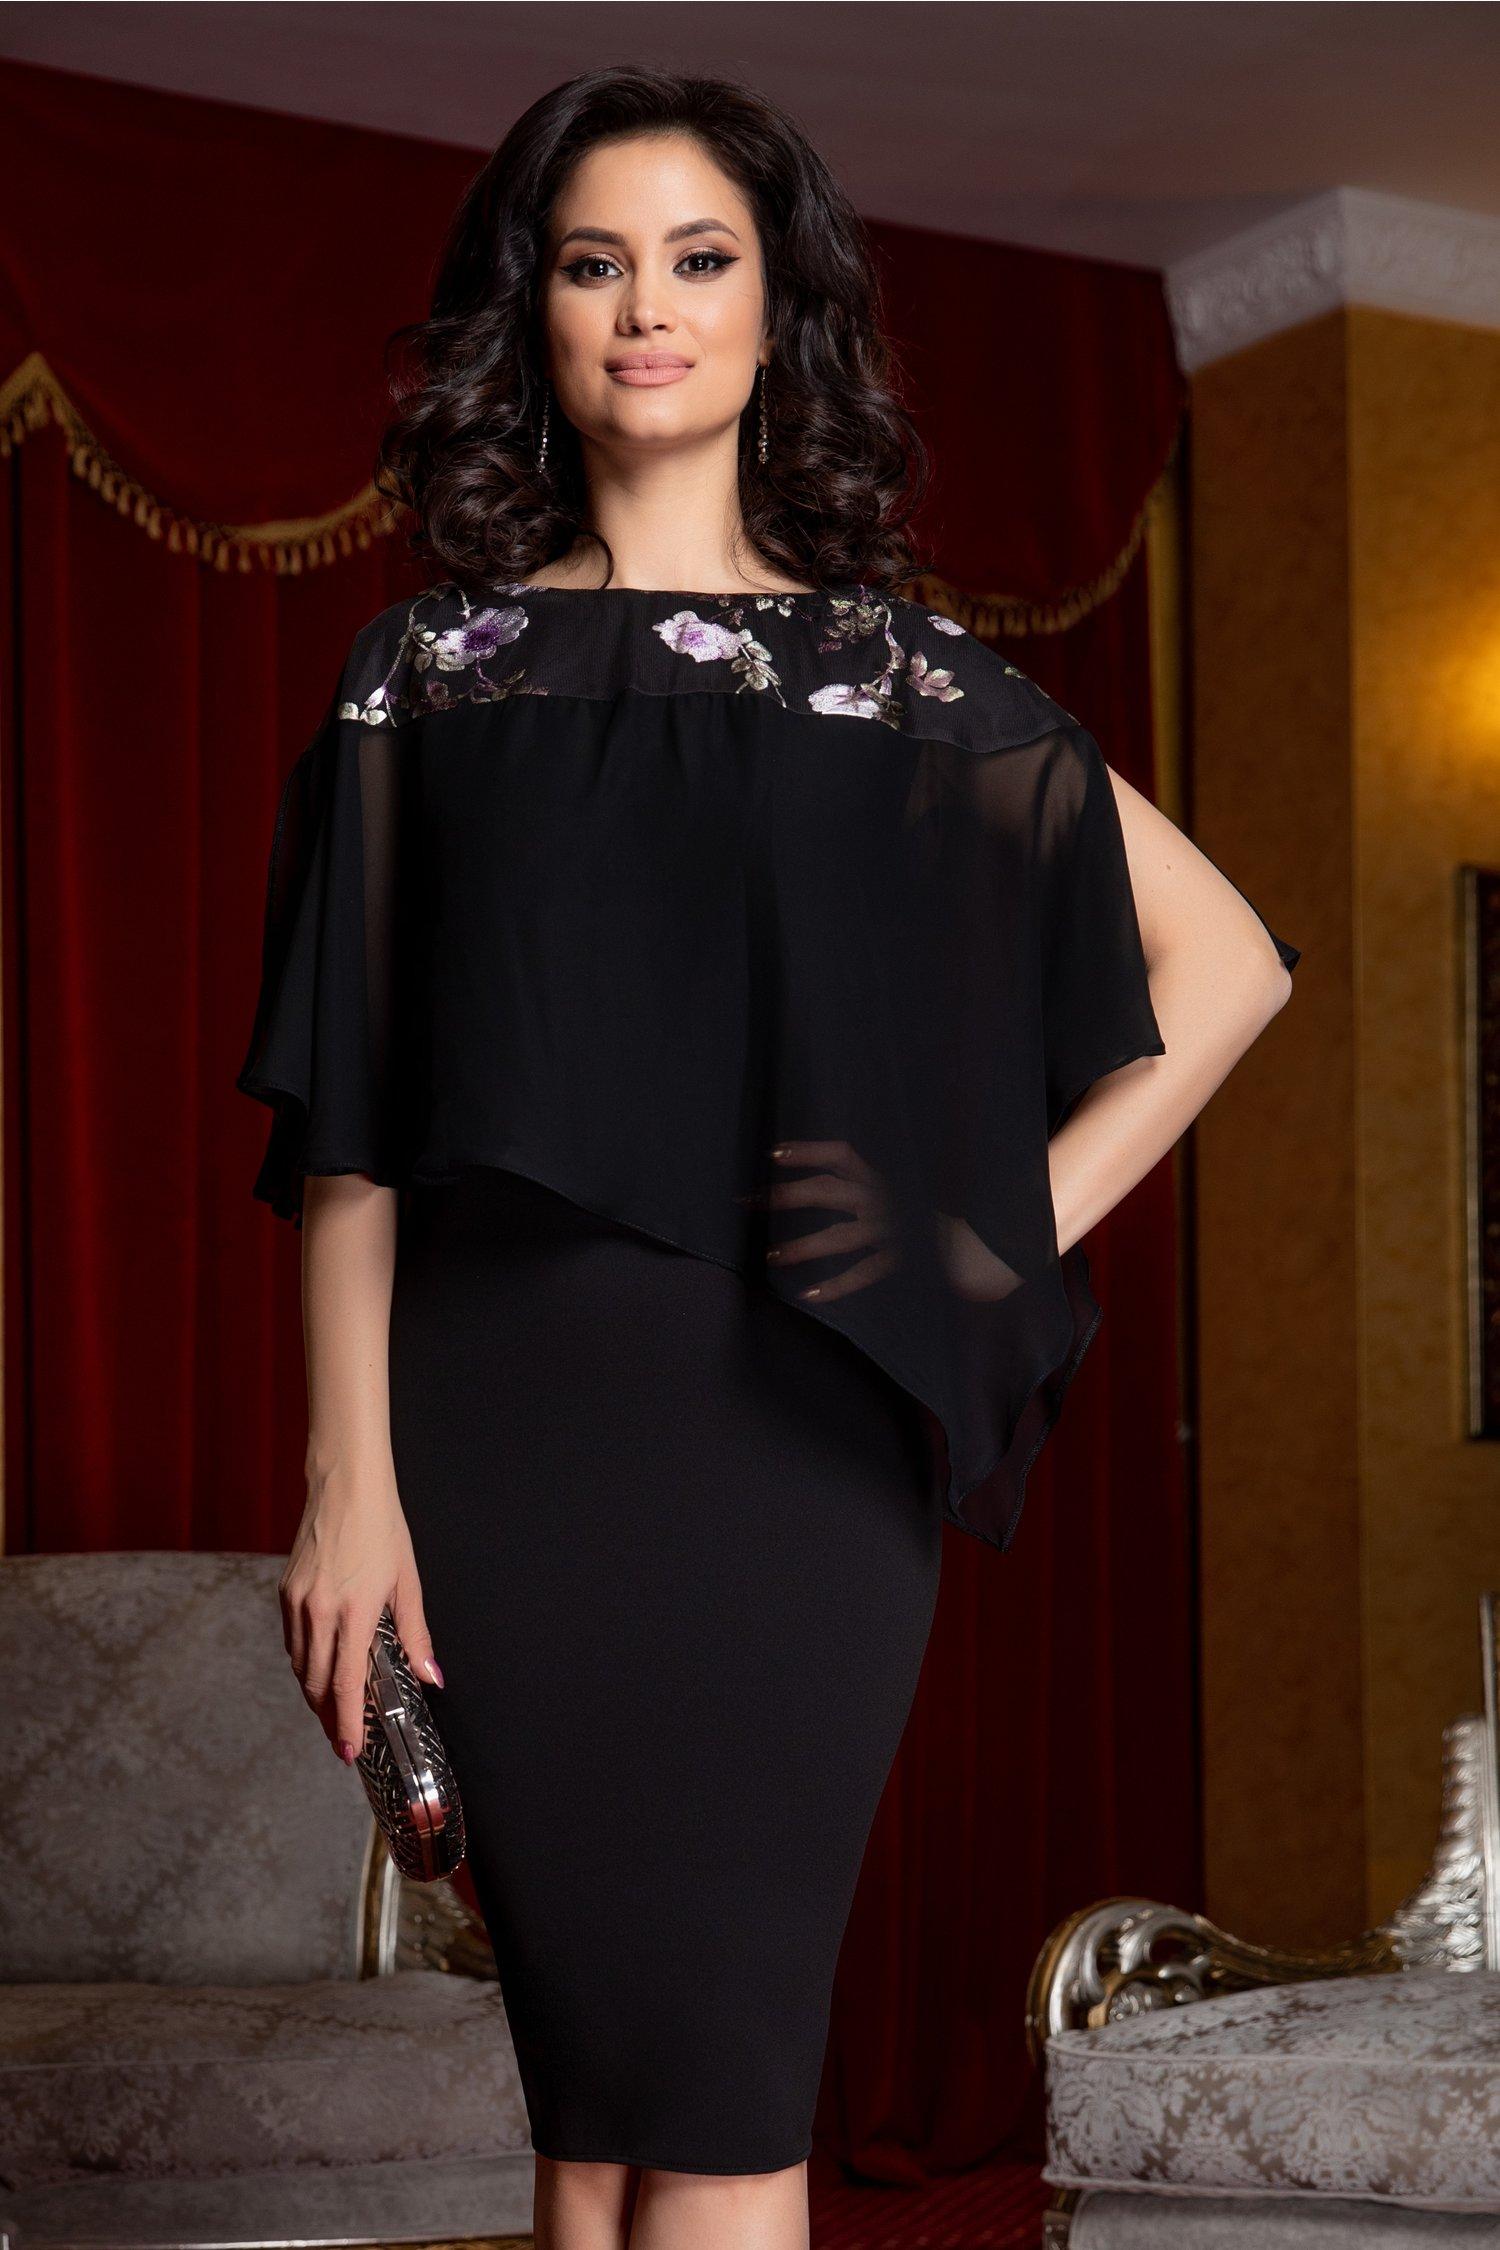 Rochie Katalyna neagra cu imprimeu floral lila la umeri